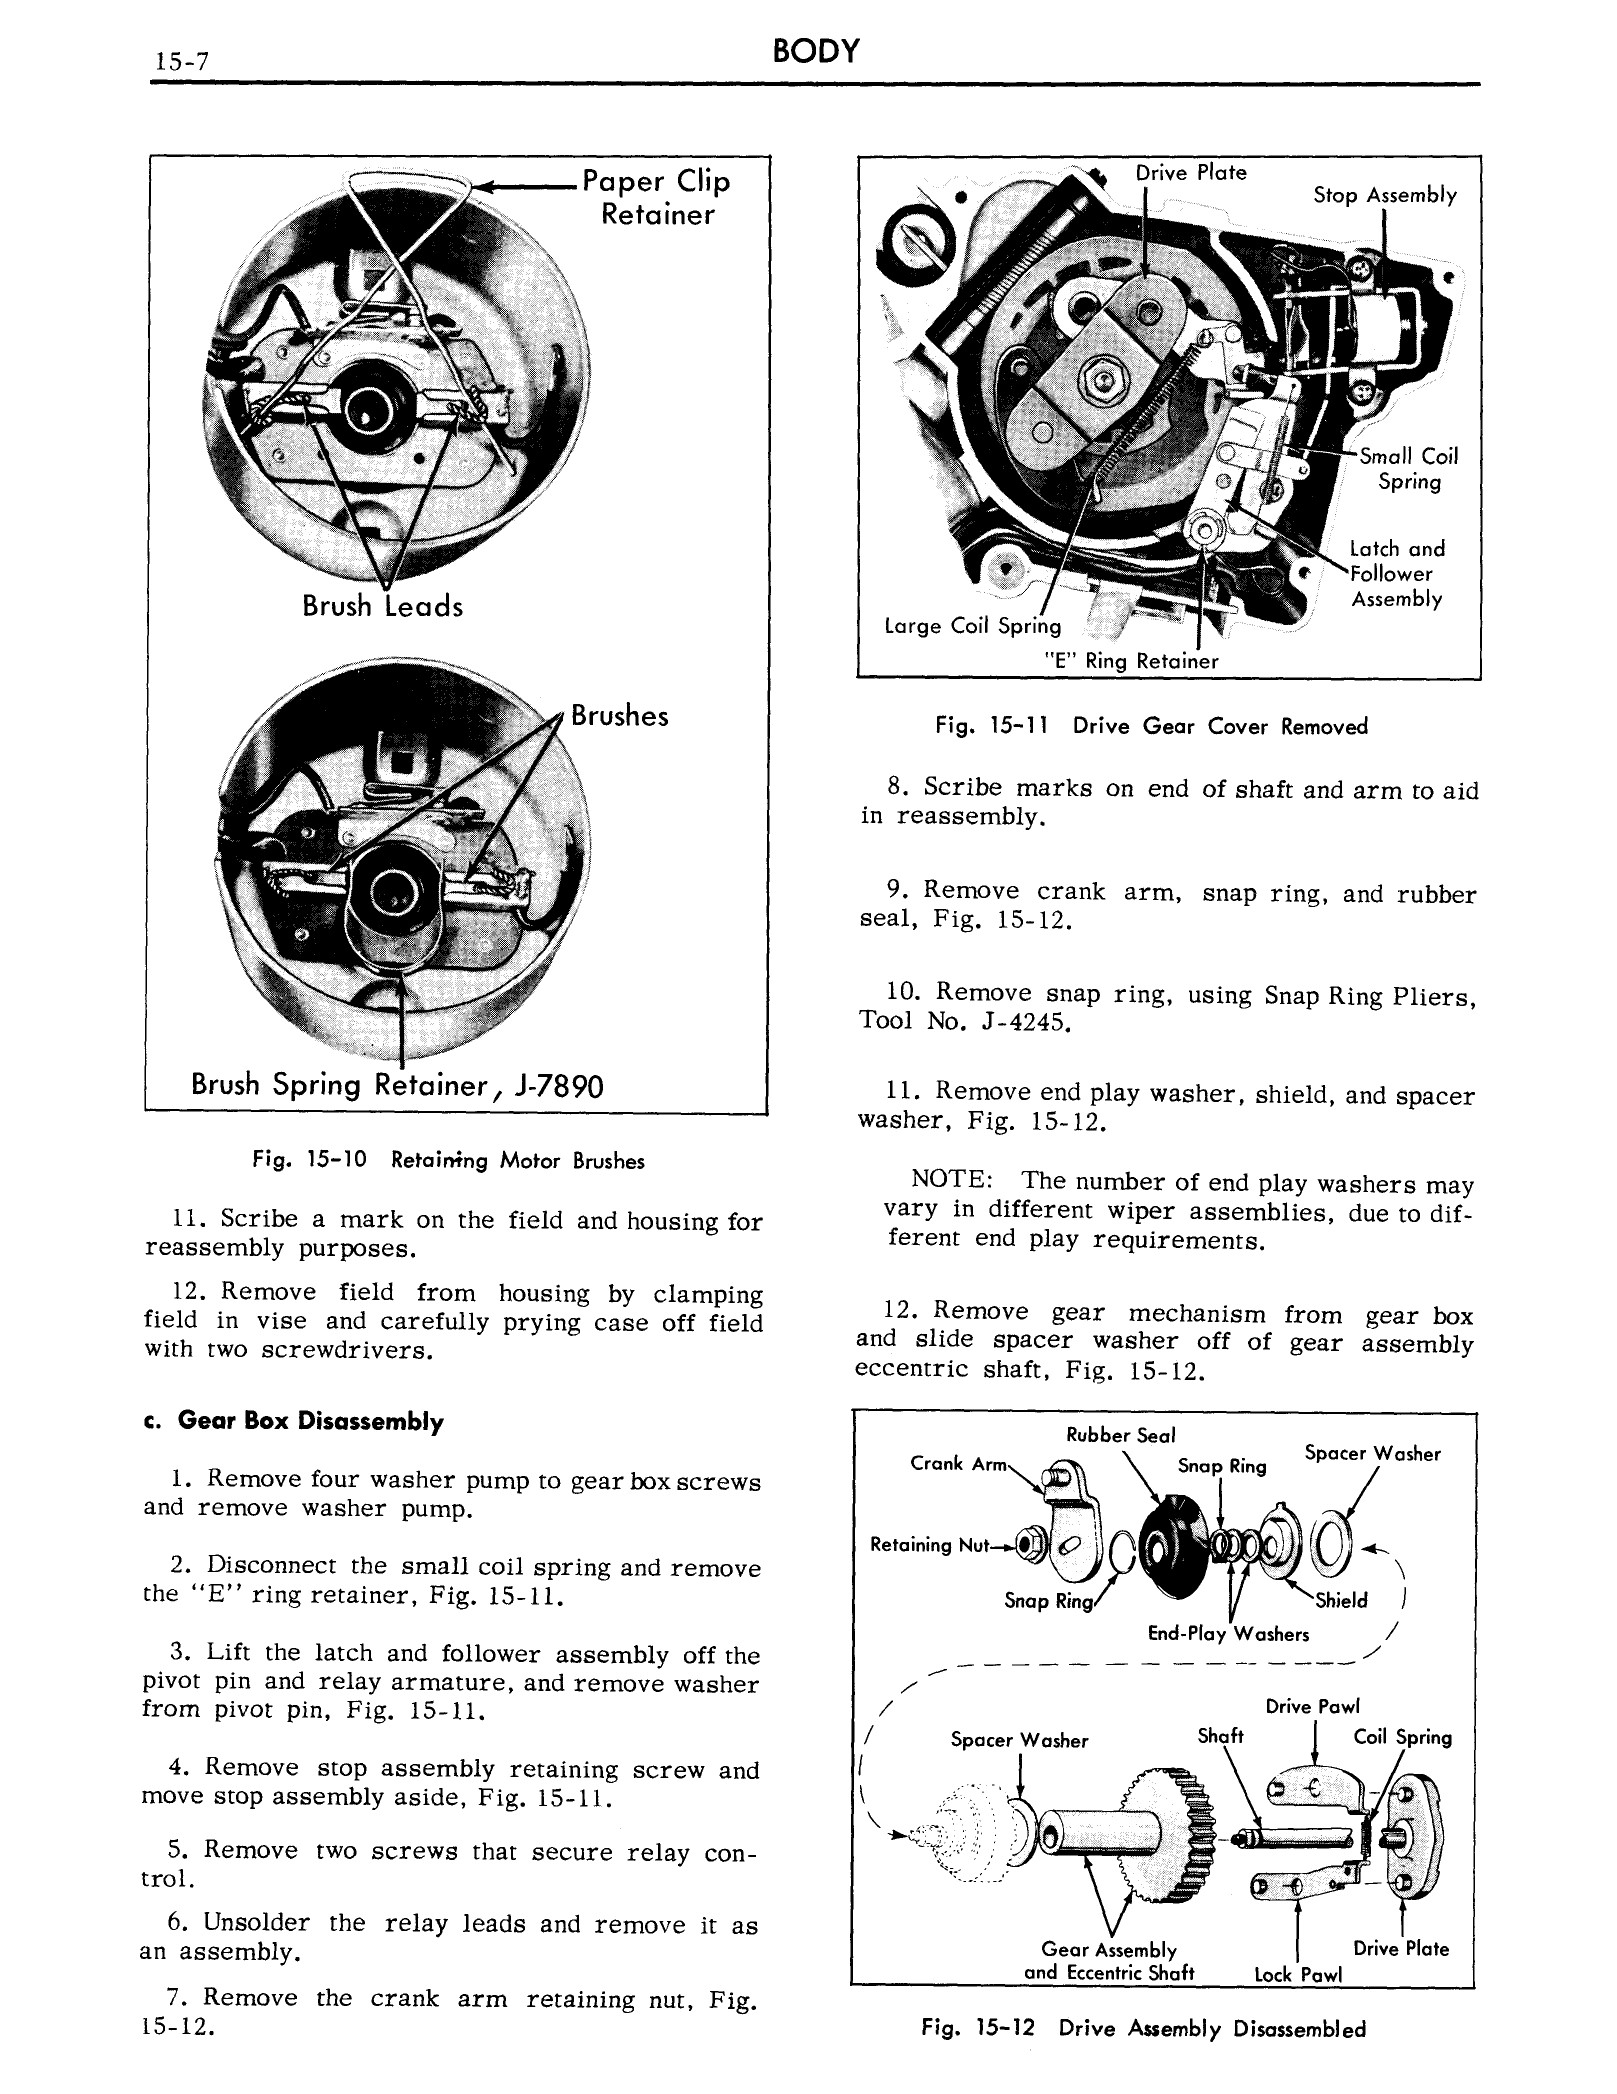 1959 Cadillac Shop Manual- Body Page 7 of 99